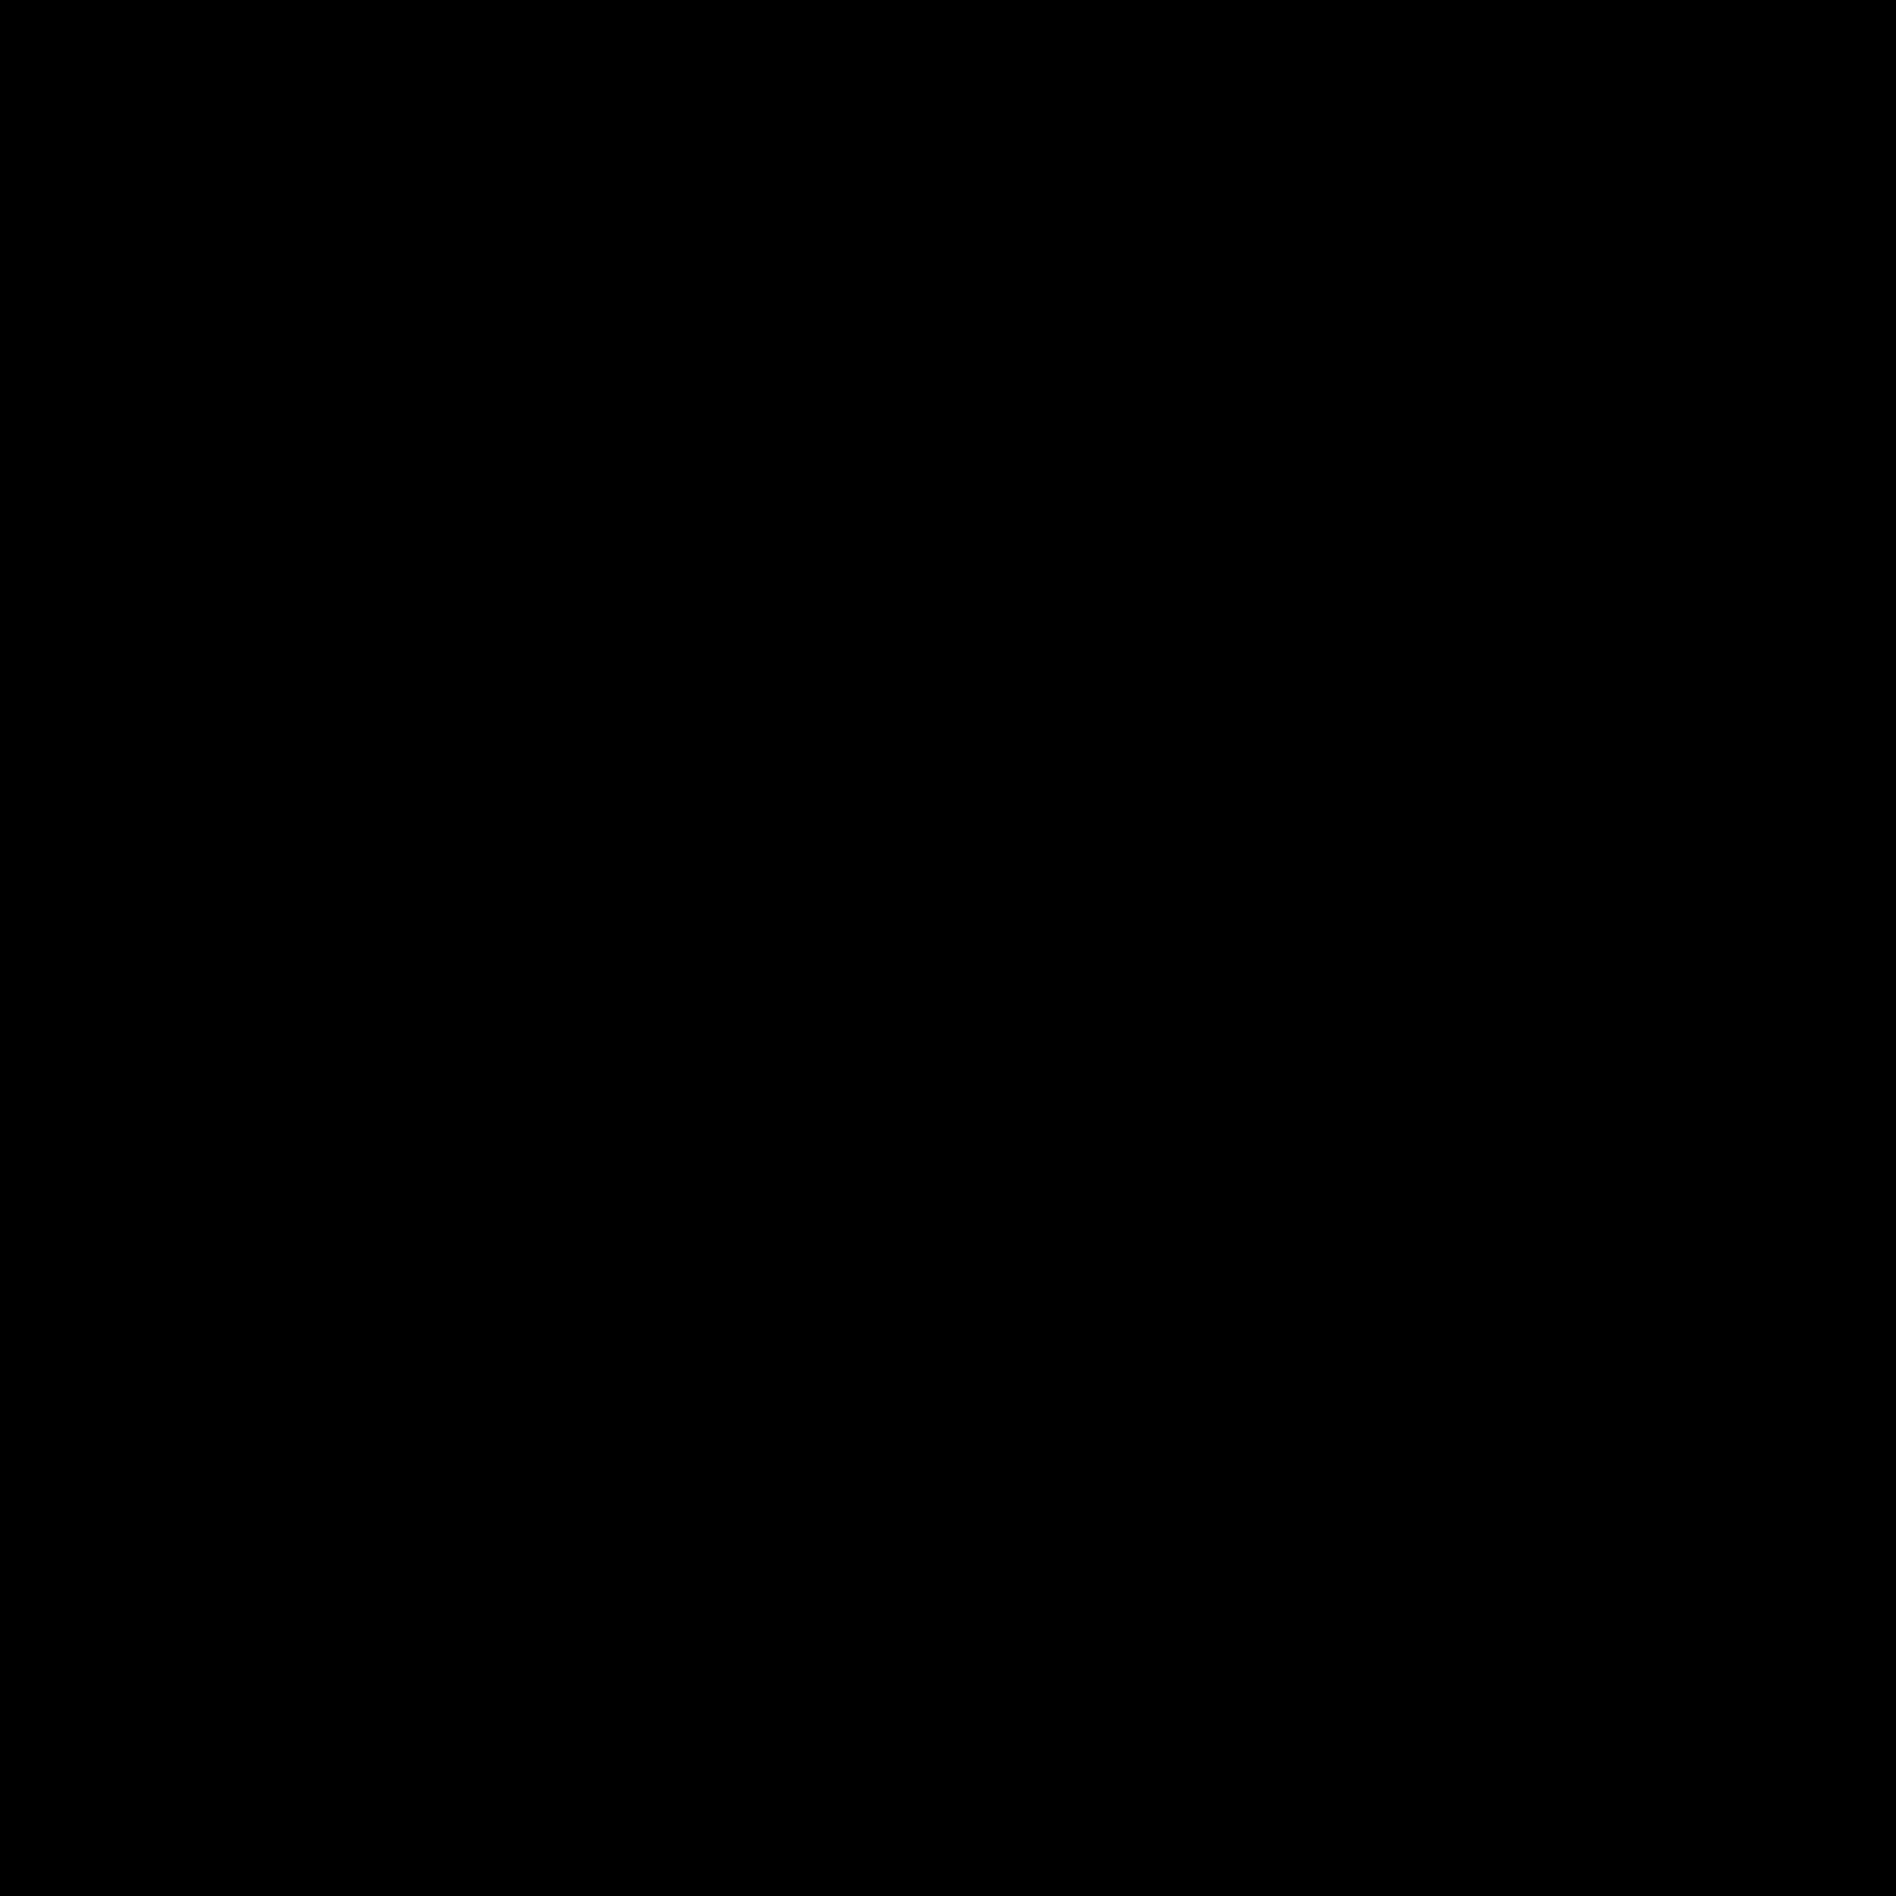 Велика синя сумка з гобелену та джинсу (з овальним дном) арт.19001-1